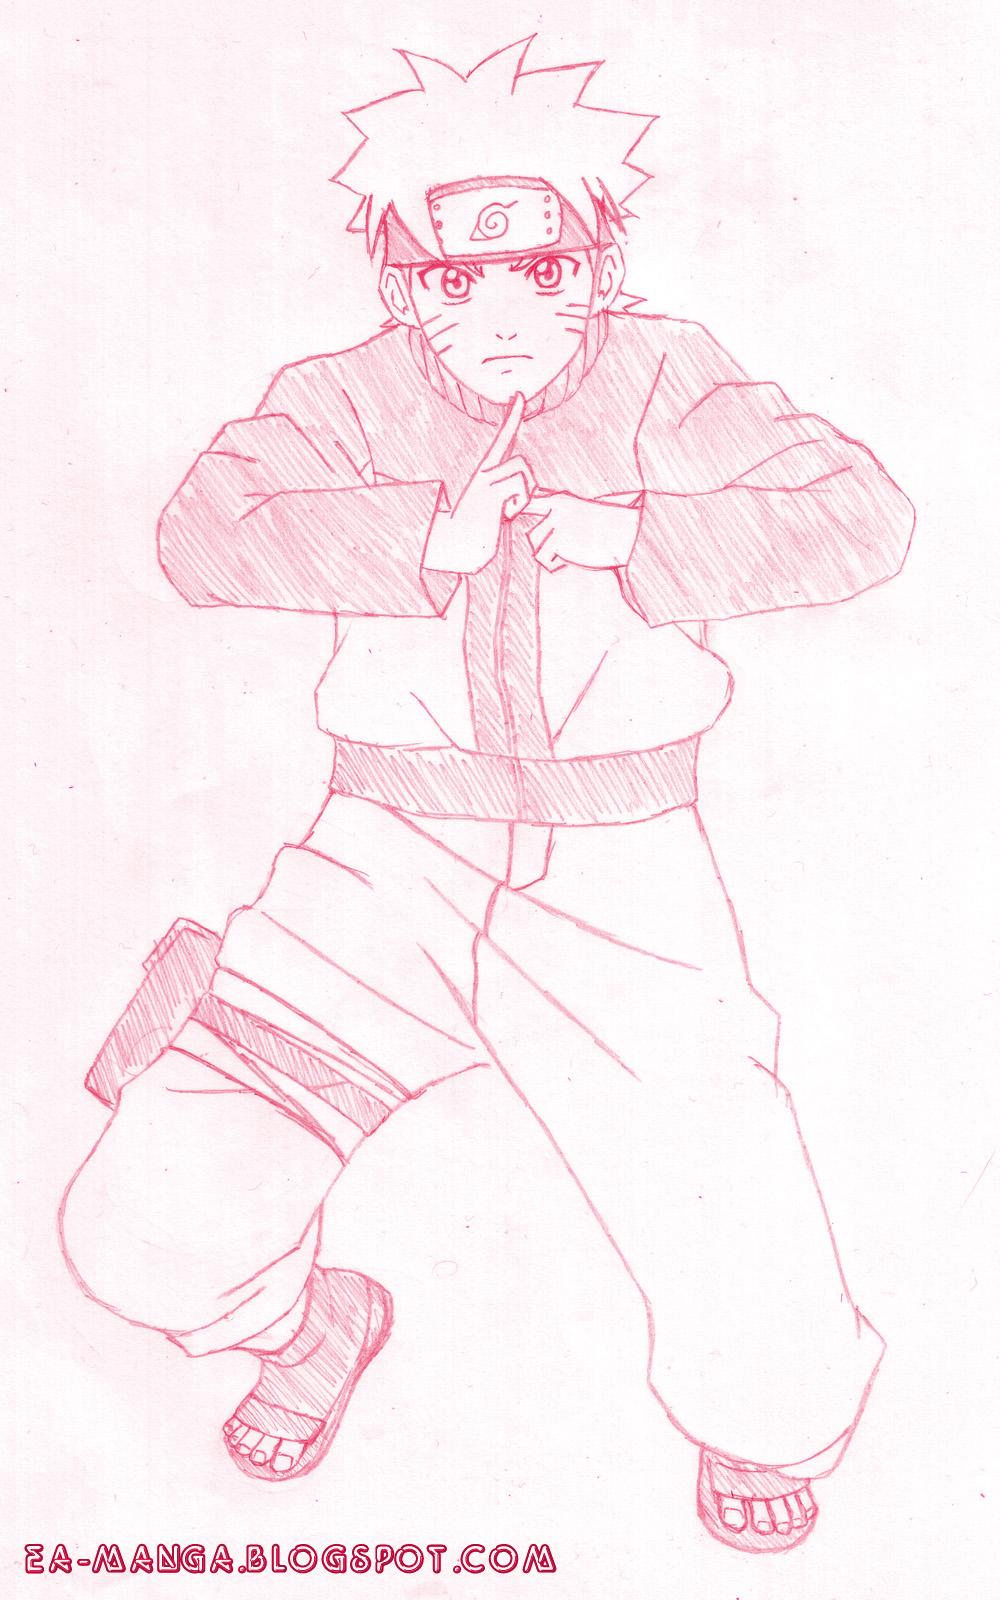 Cara melukis anime naruto yg benar!: Cara melukis naruto yg baik ...